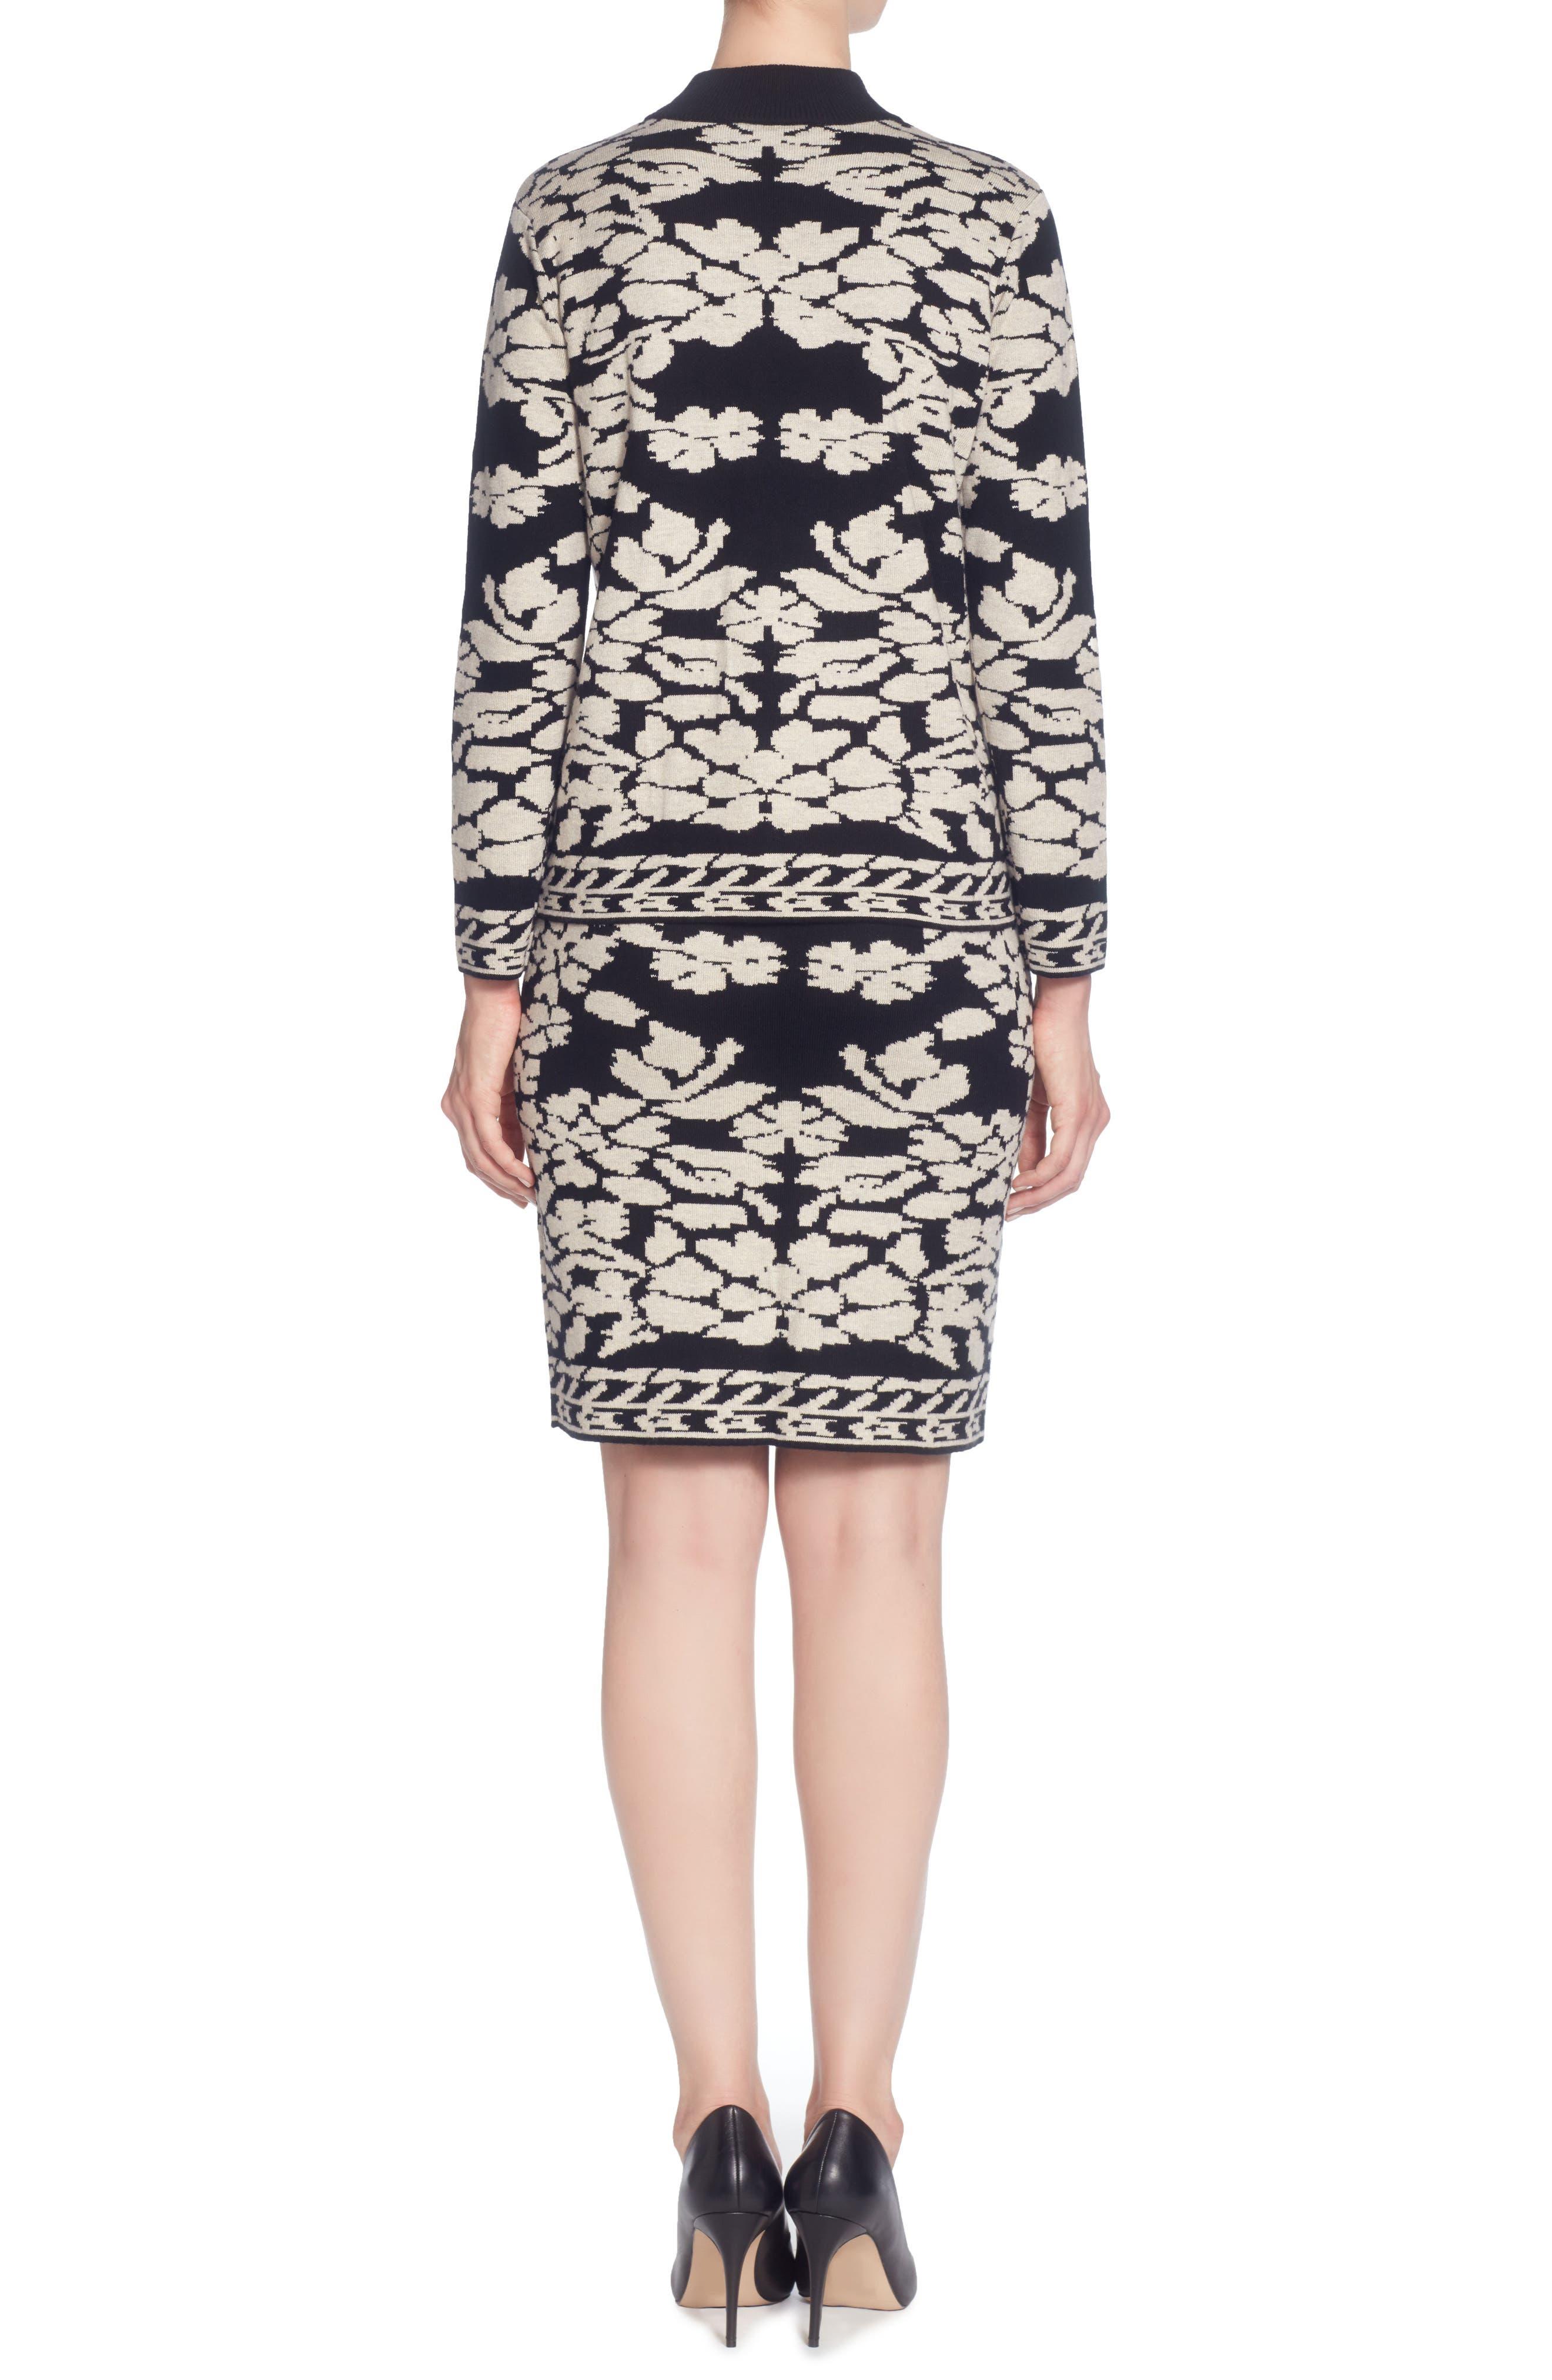 Uffie Floral Knit Skirt,                             Alternate thumbnail 2, color,                             Black/ Neutral